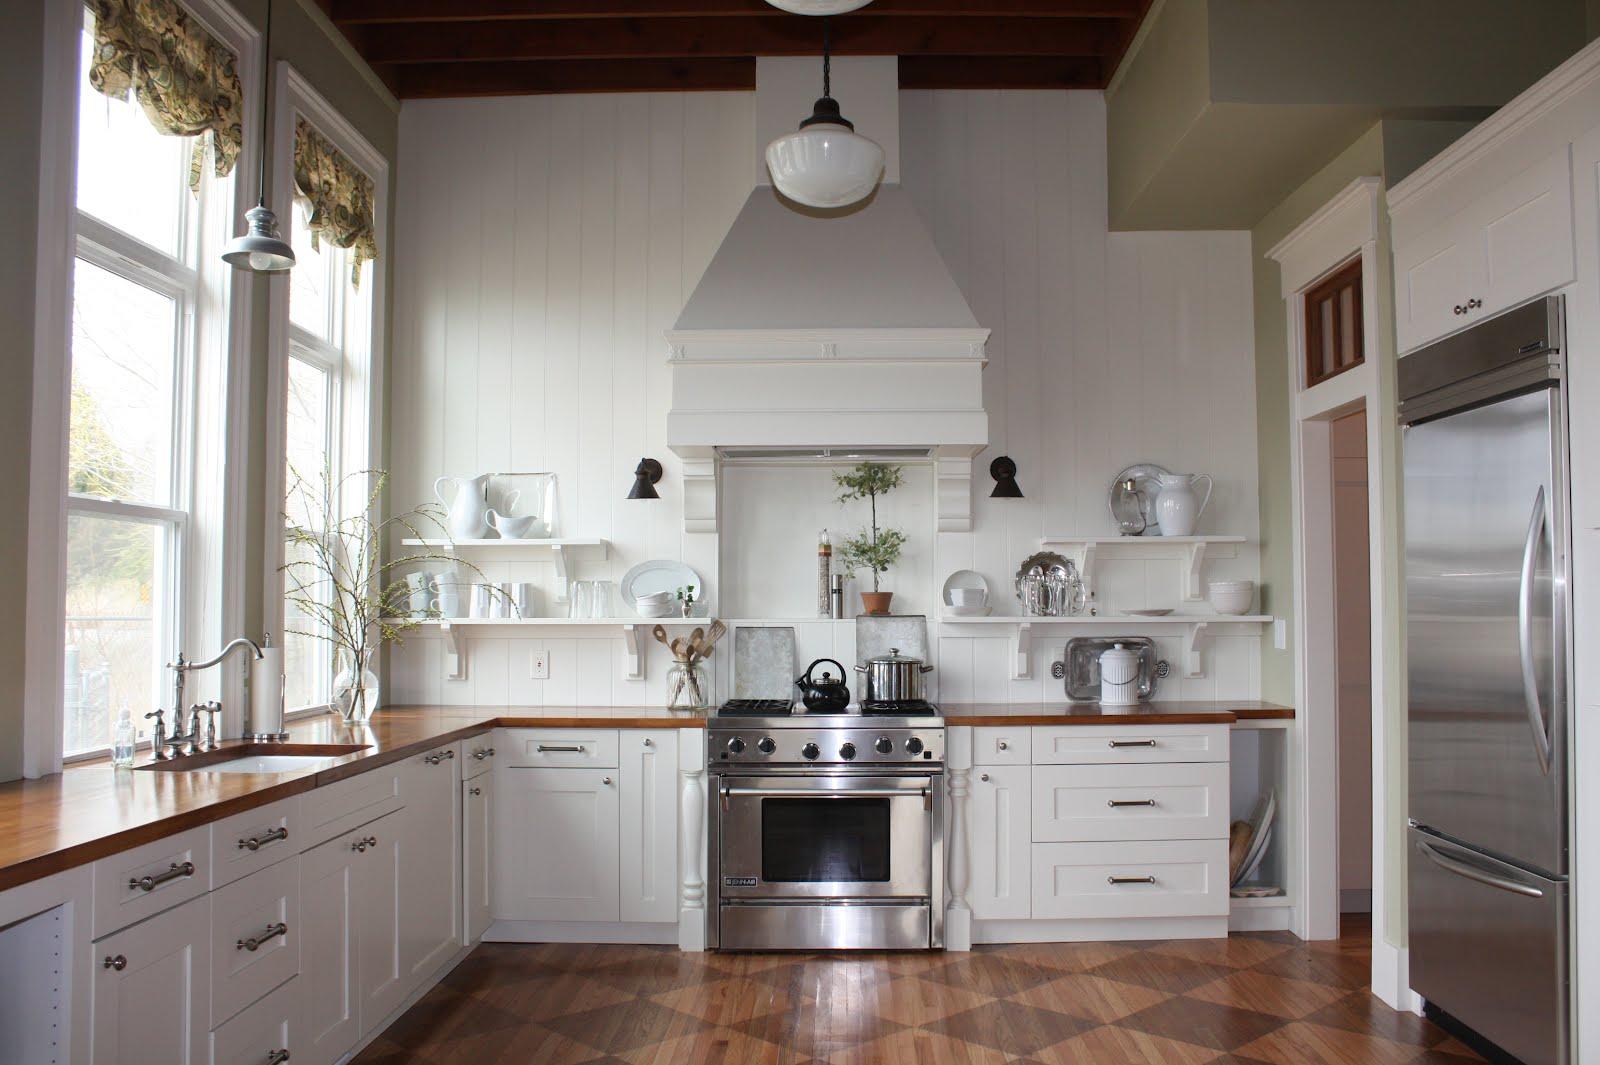 Uncategorized Kitchen Without Backsplash no backsplash in kitchen this old church house update and house